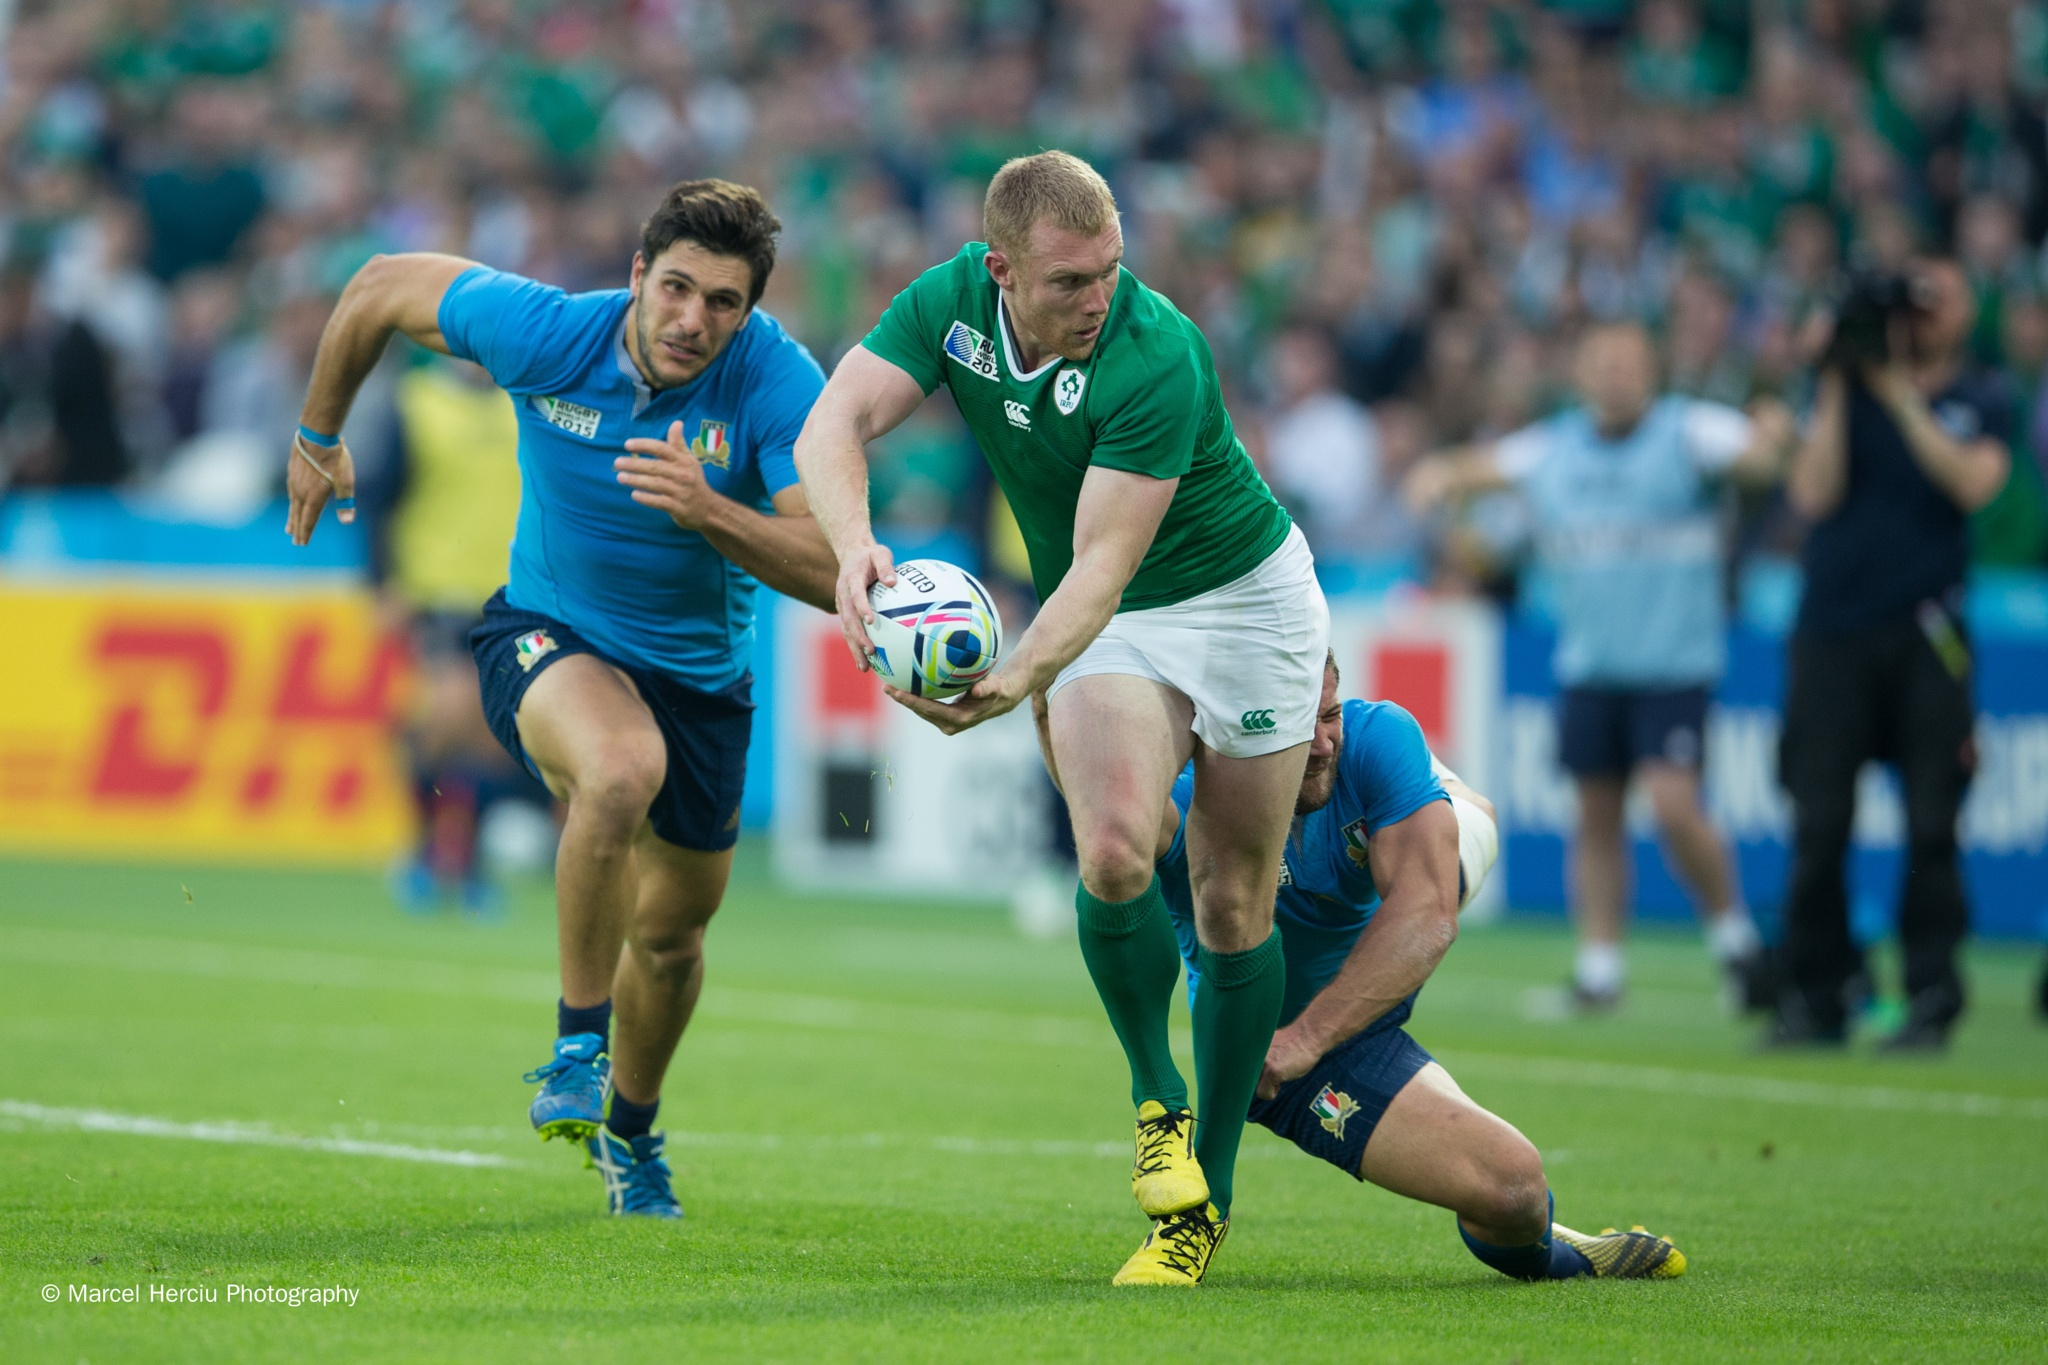 Ireland v Italy by Marcel Herciu